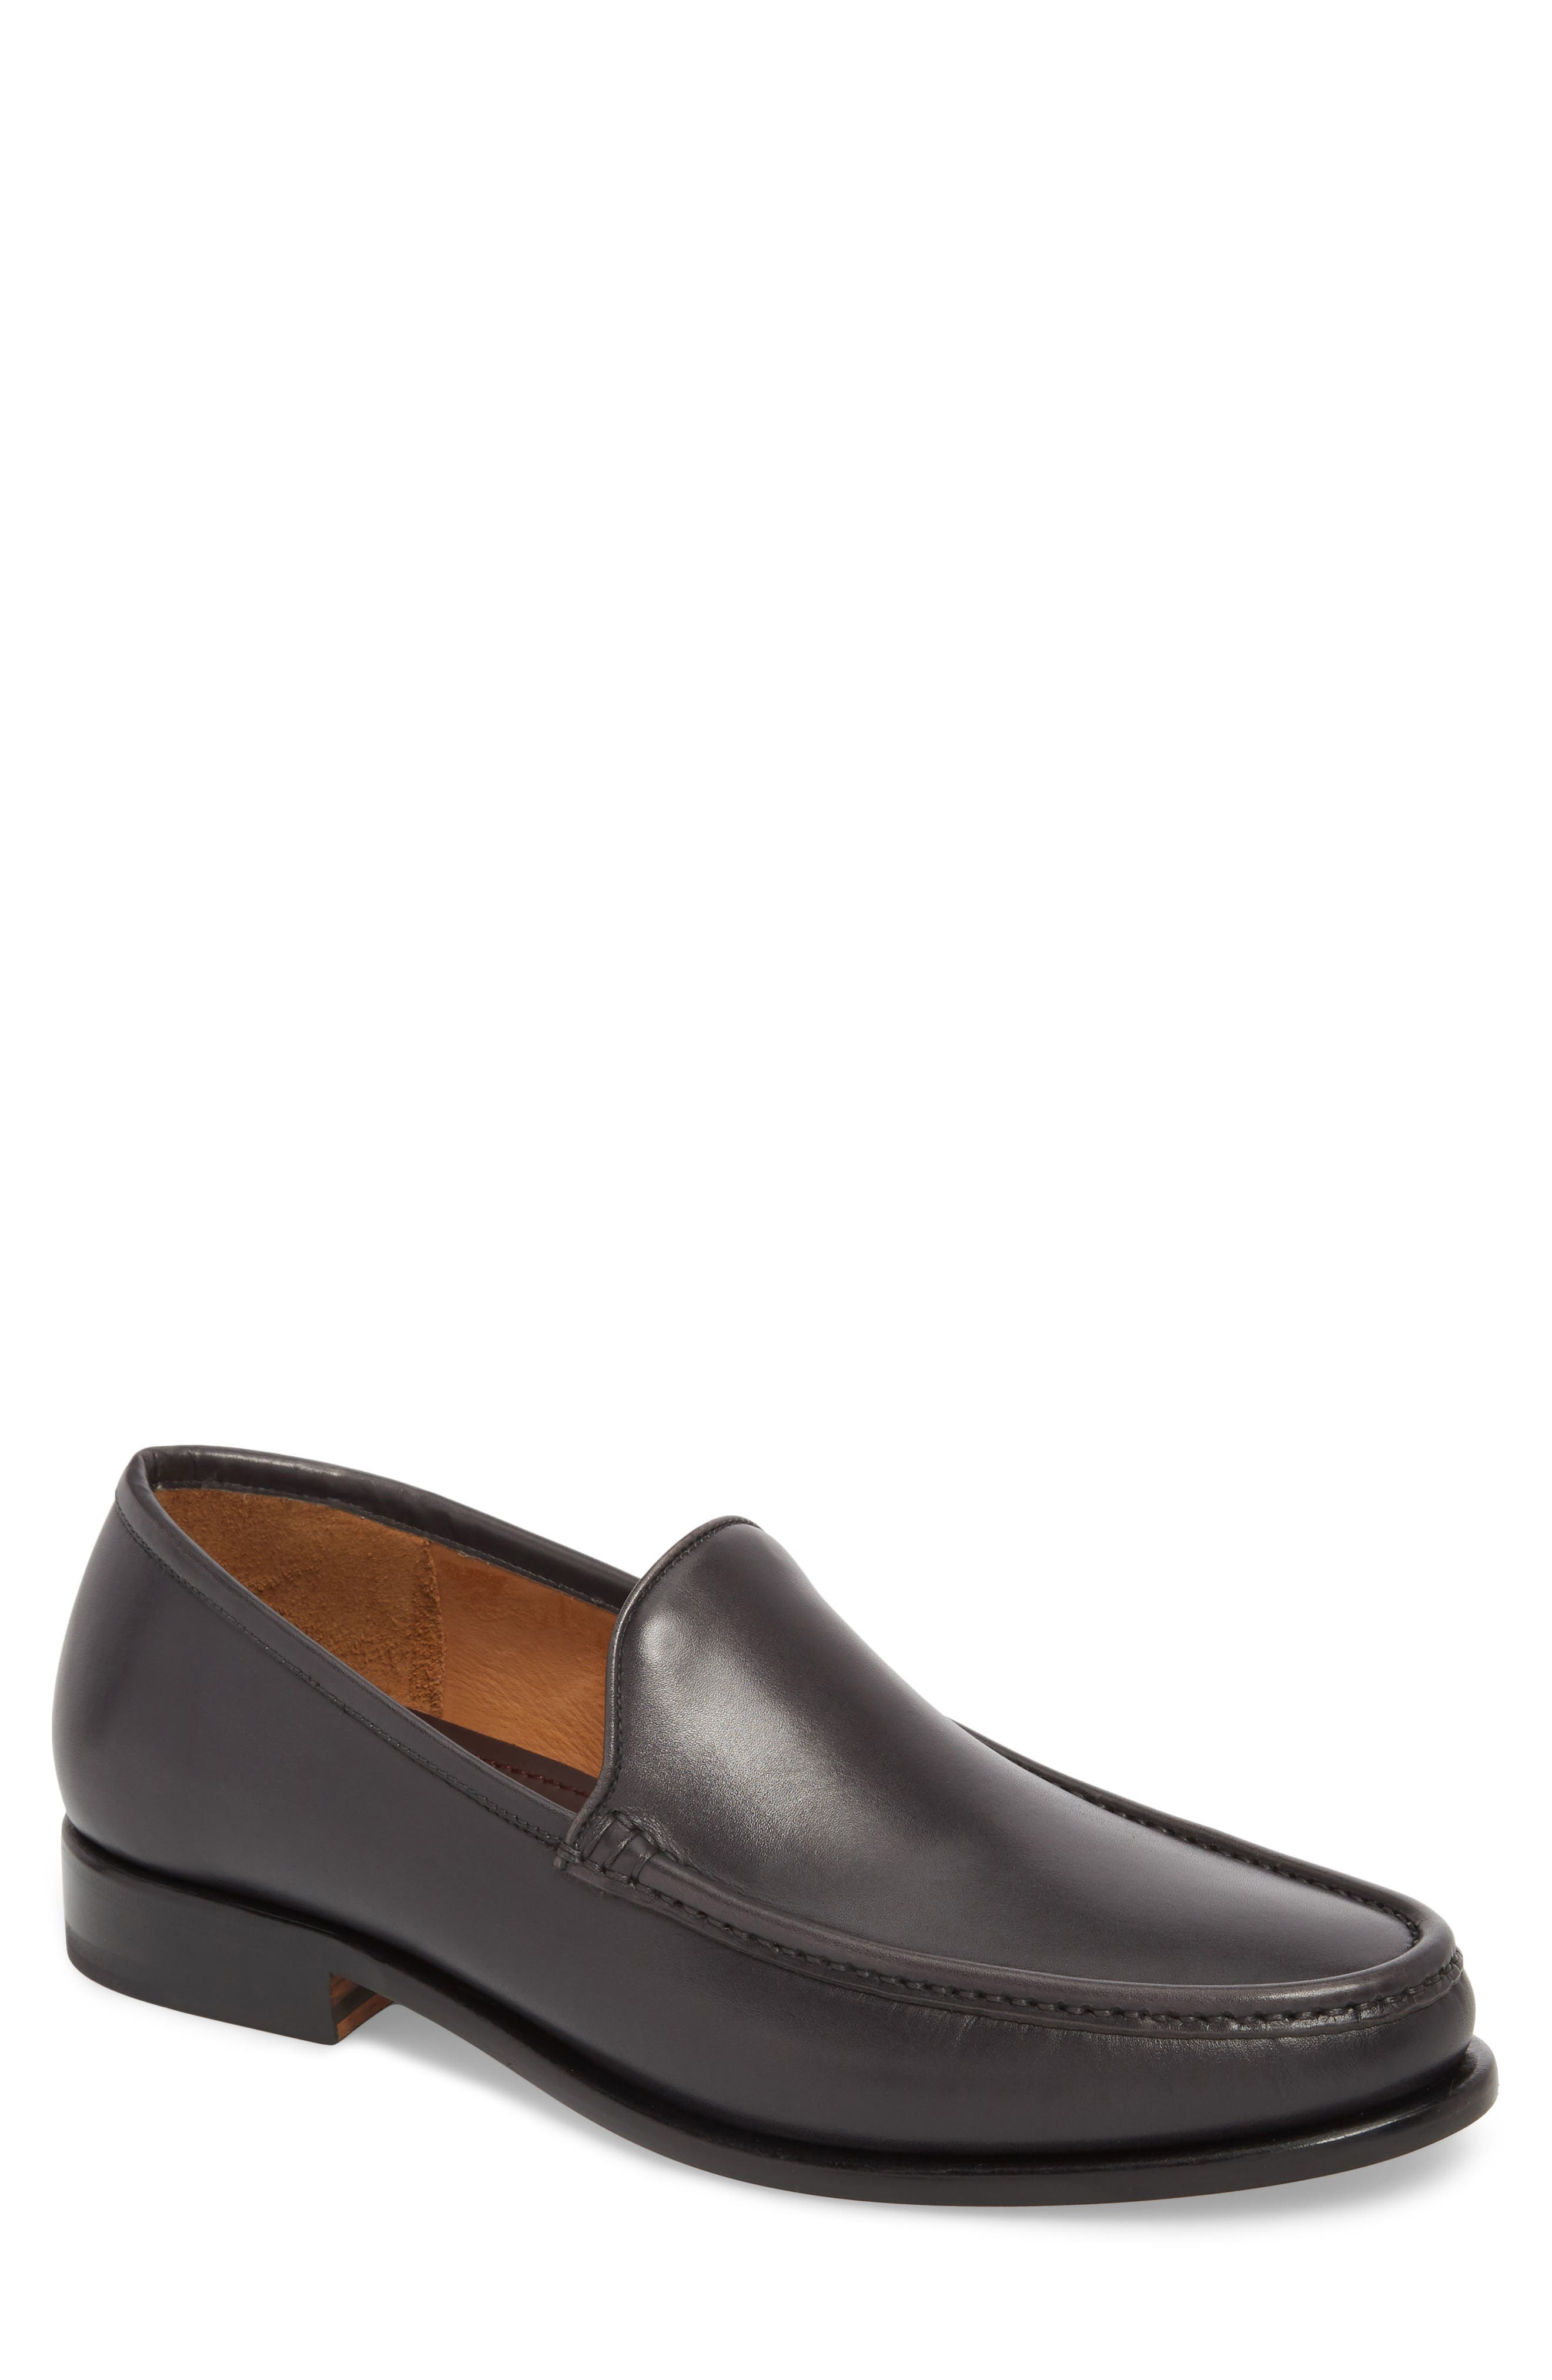 Ello Moc Toe Loafer,                         Main,                         color, DARK GREY